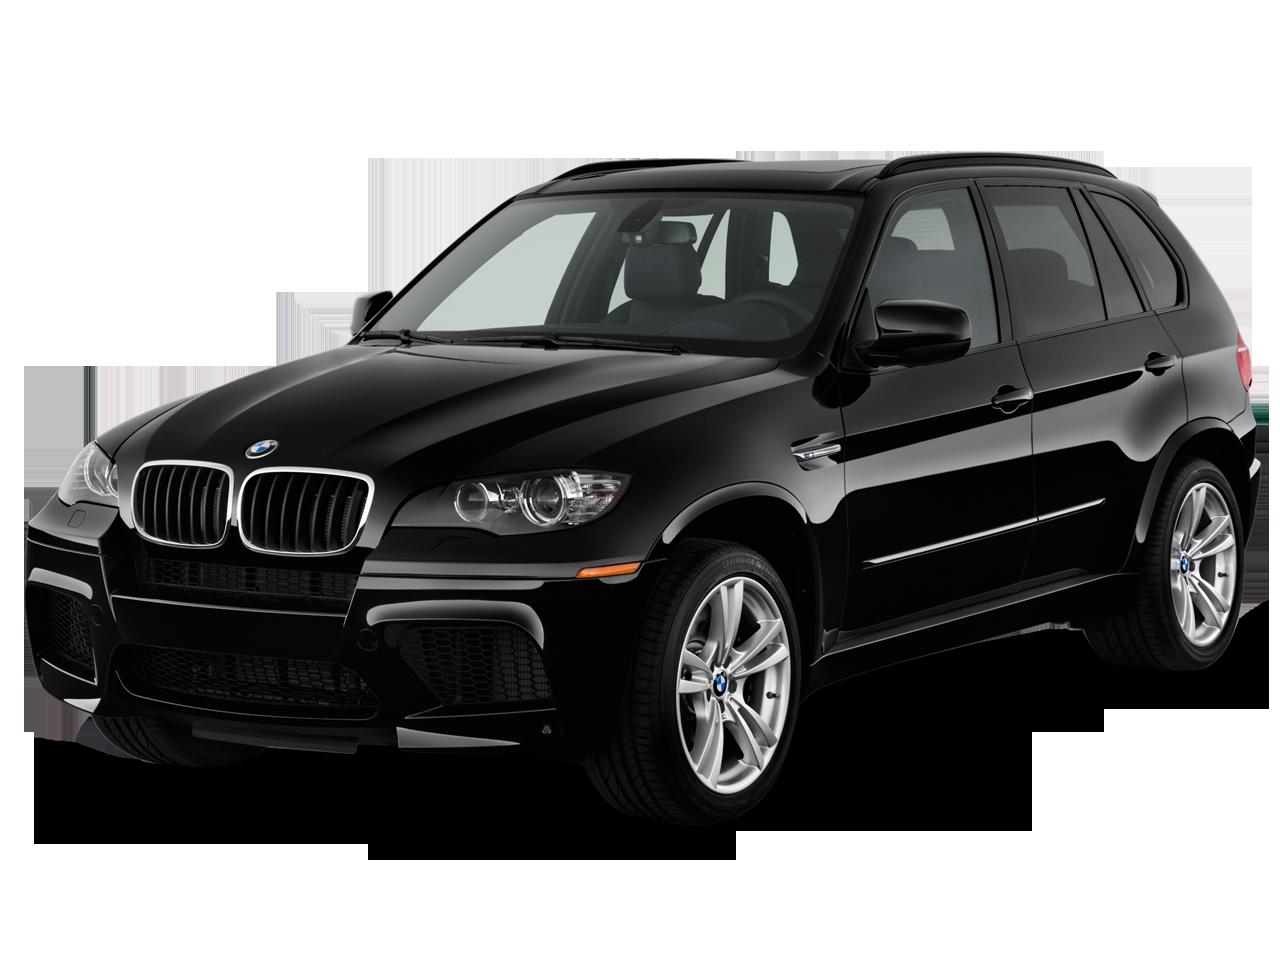 BMW X5 Transparent Background.